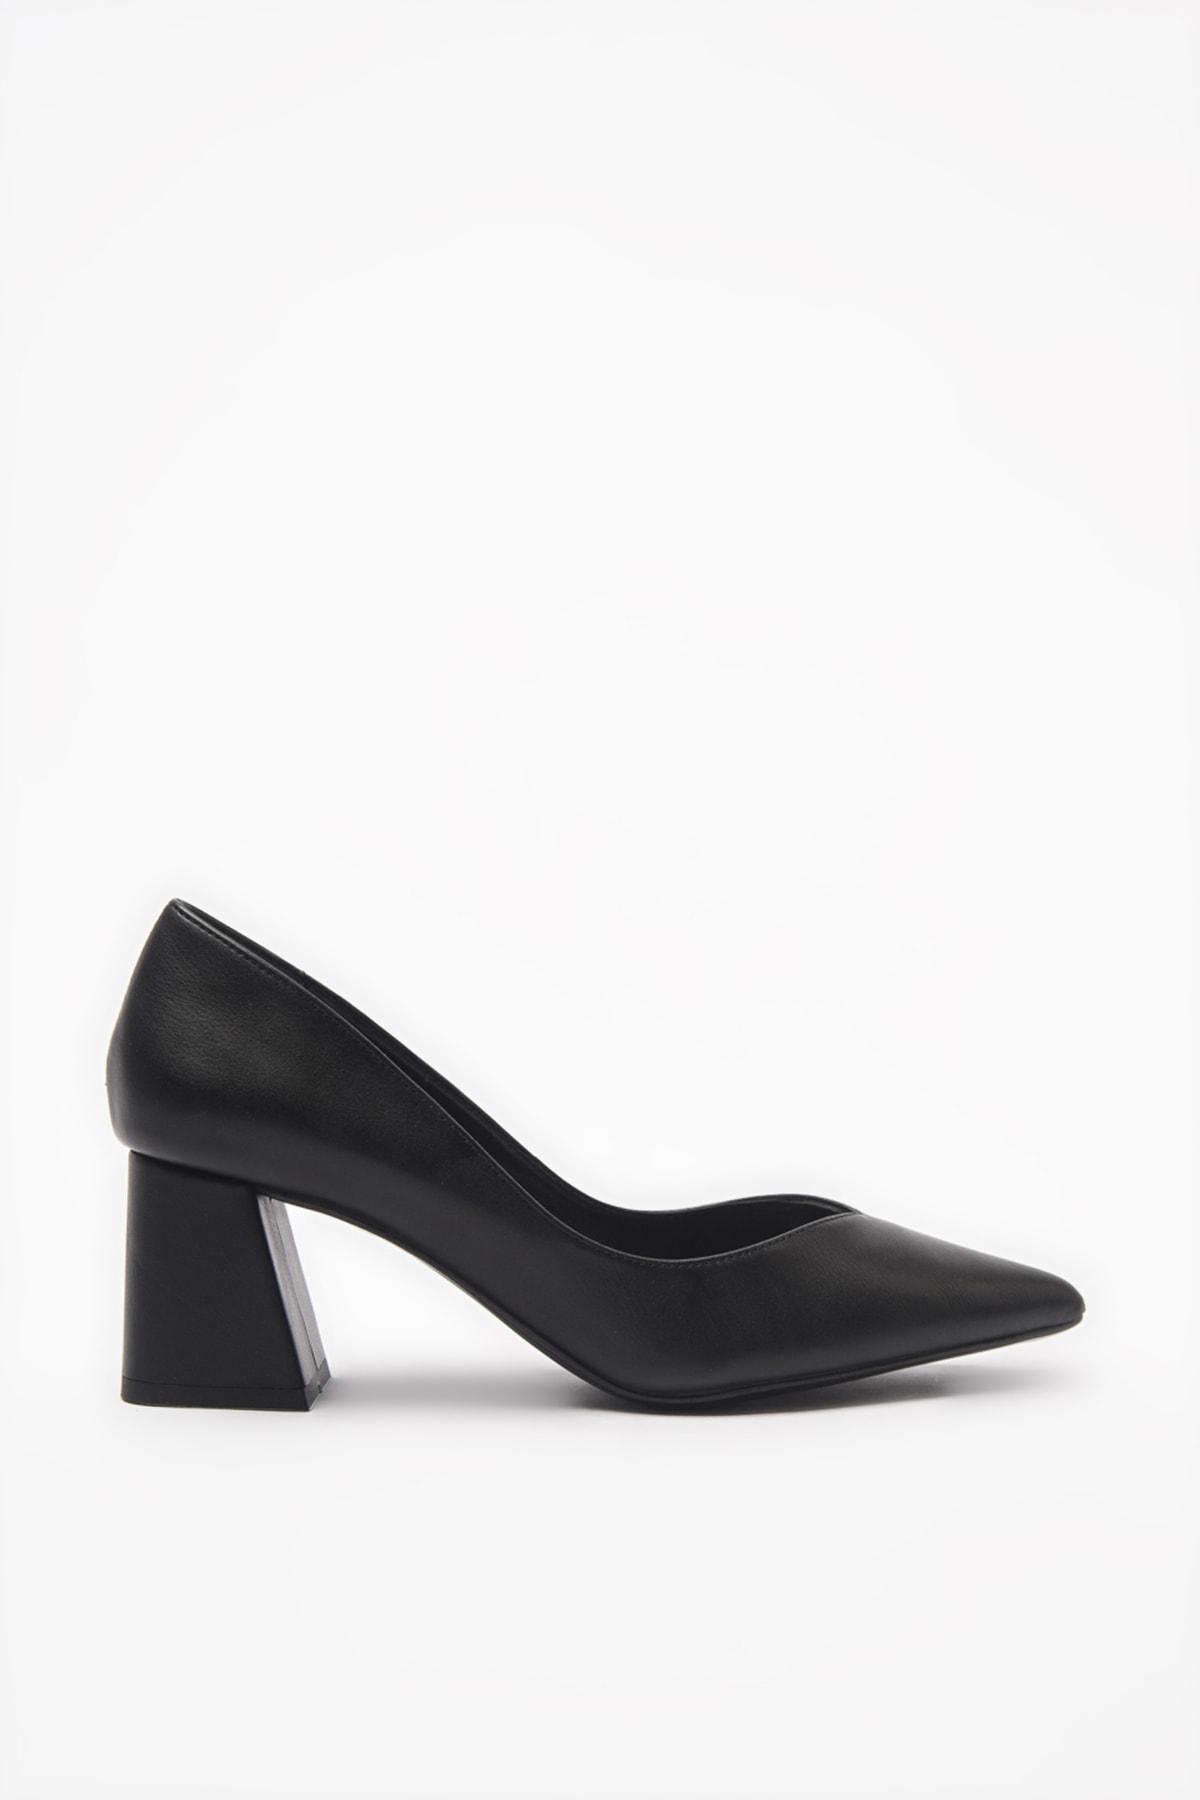 Hotiç Siyah Kadın Klasik Topuklu Ayakkabı 01AYH193860A100 2